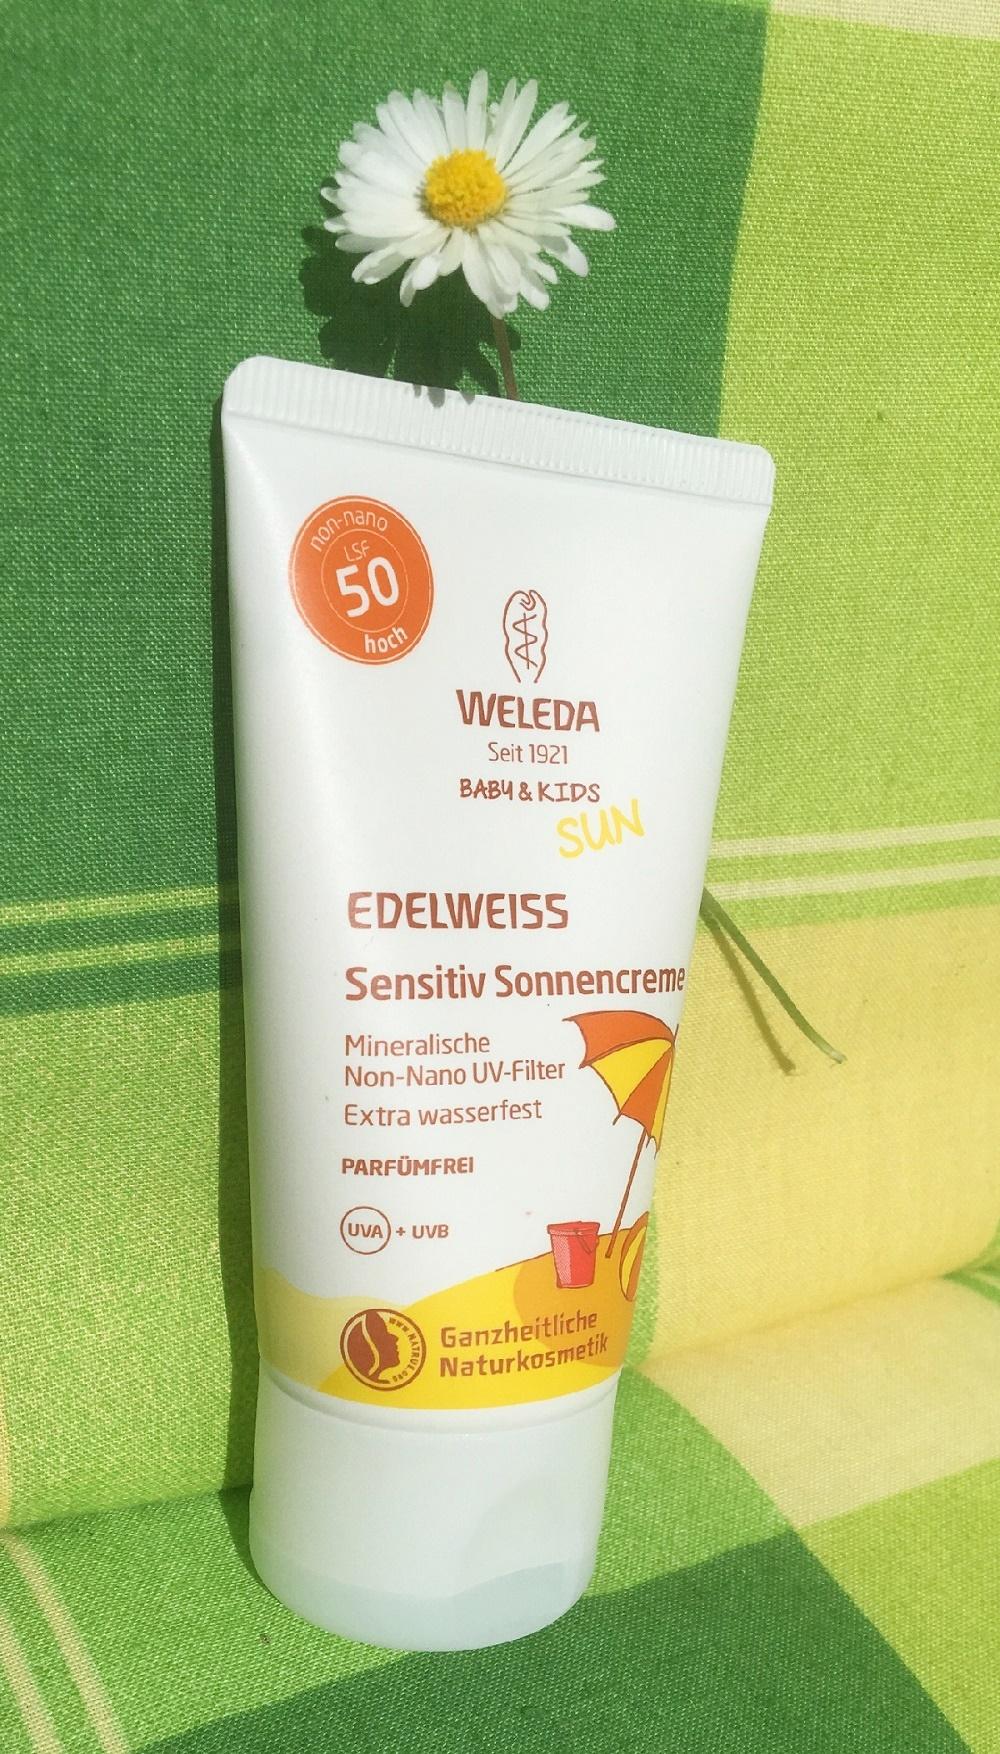 Weleda Edelweiss Sonnencreme Tube mit Gänseblümchen www.sunnyside-of-life.de